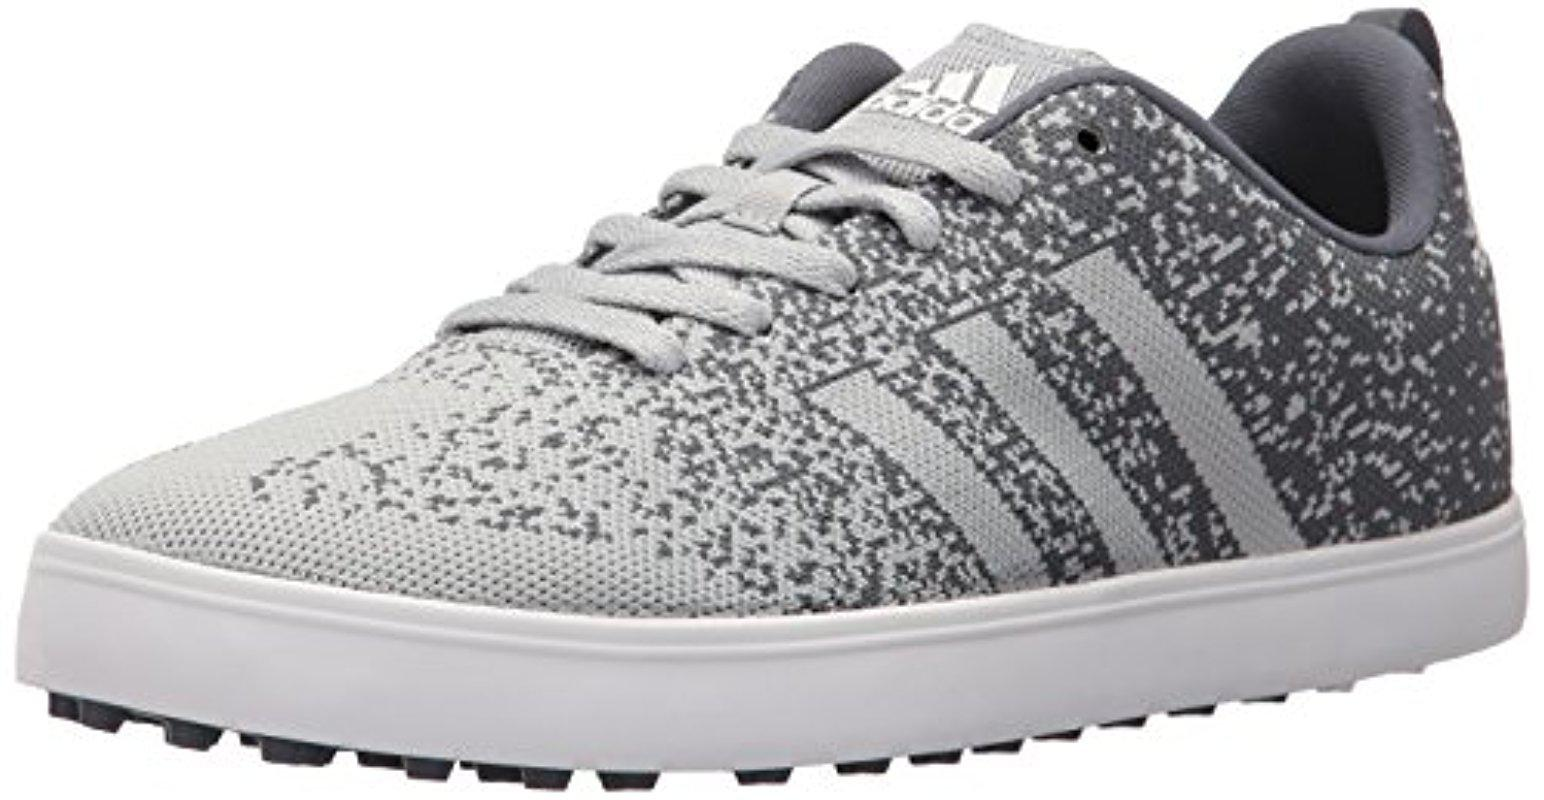 Lyst adidas adicross primeknit scarpa da golf per gli uomini.